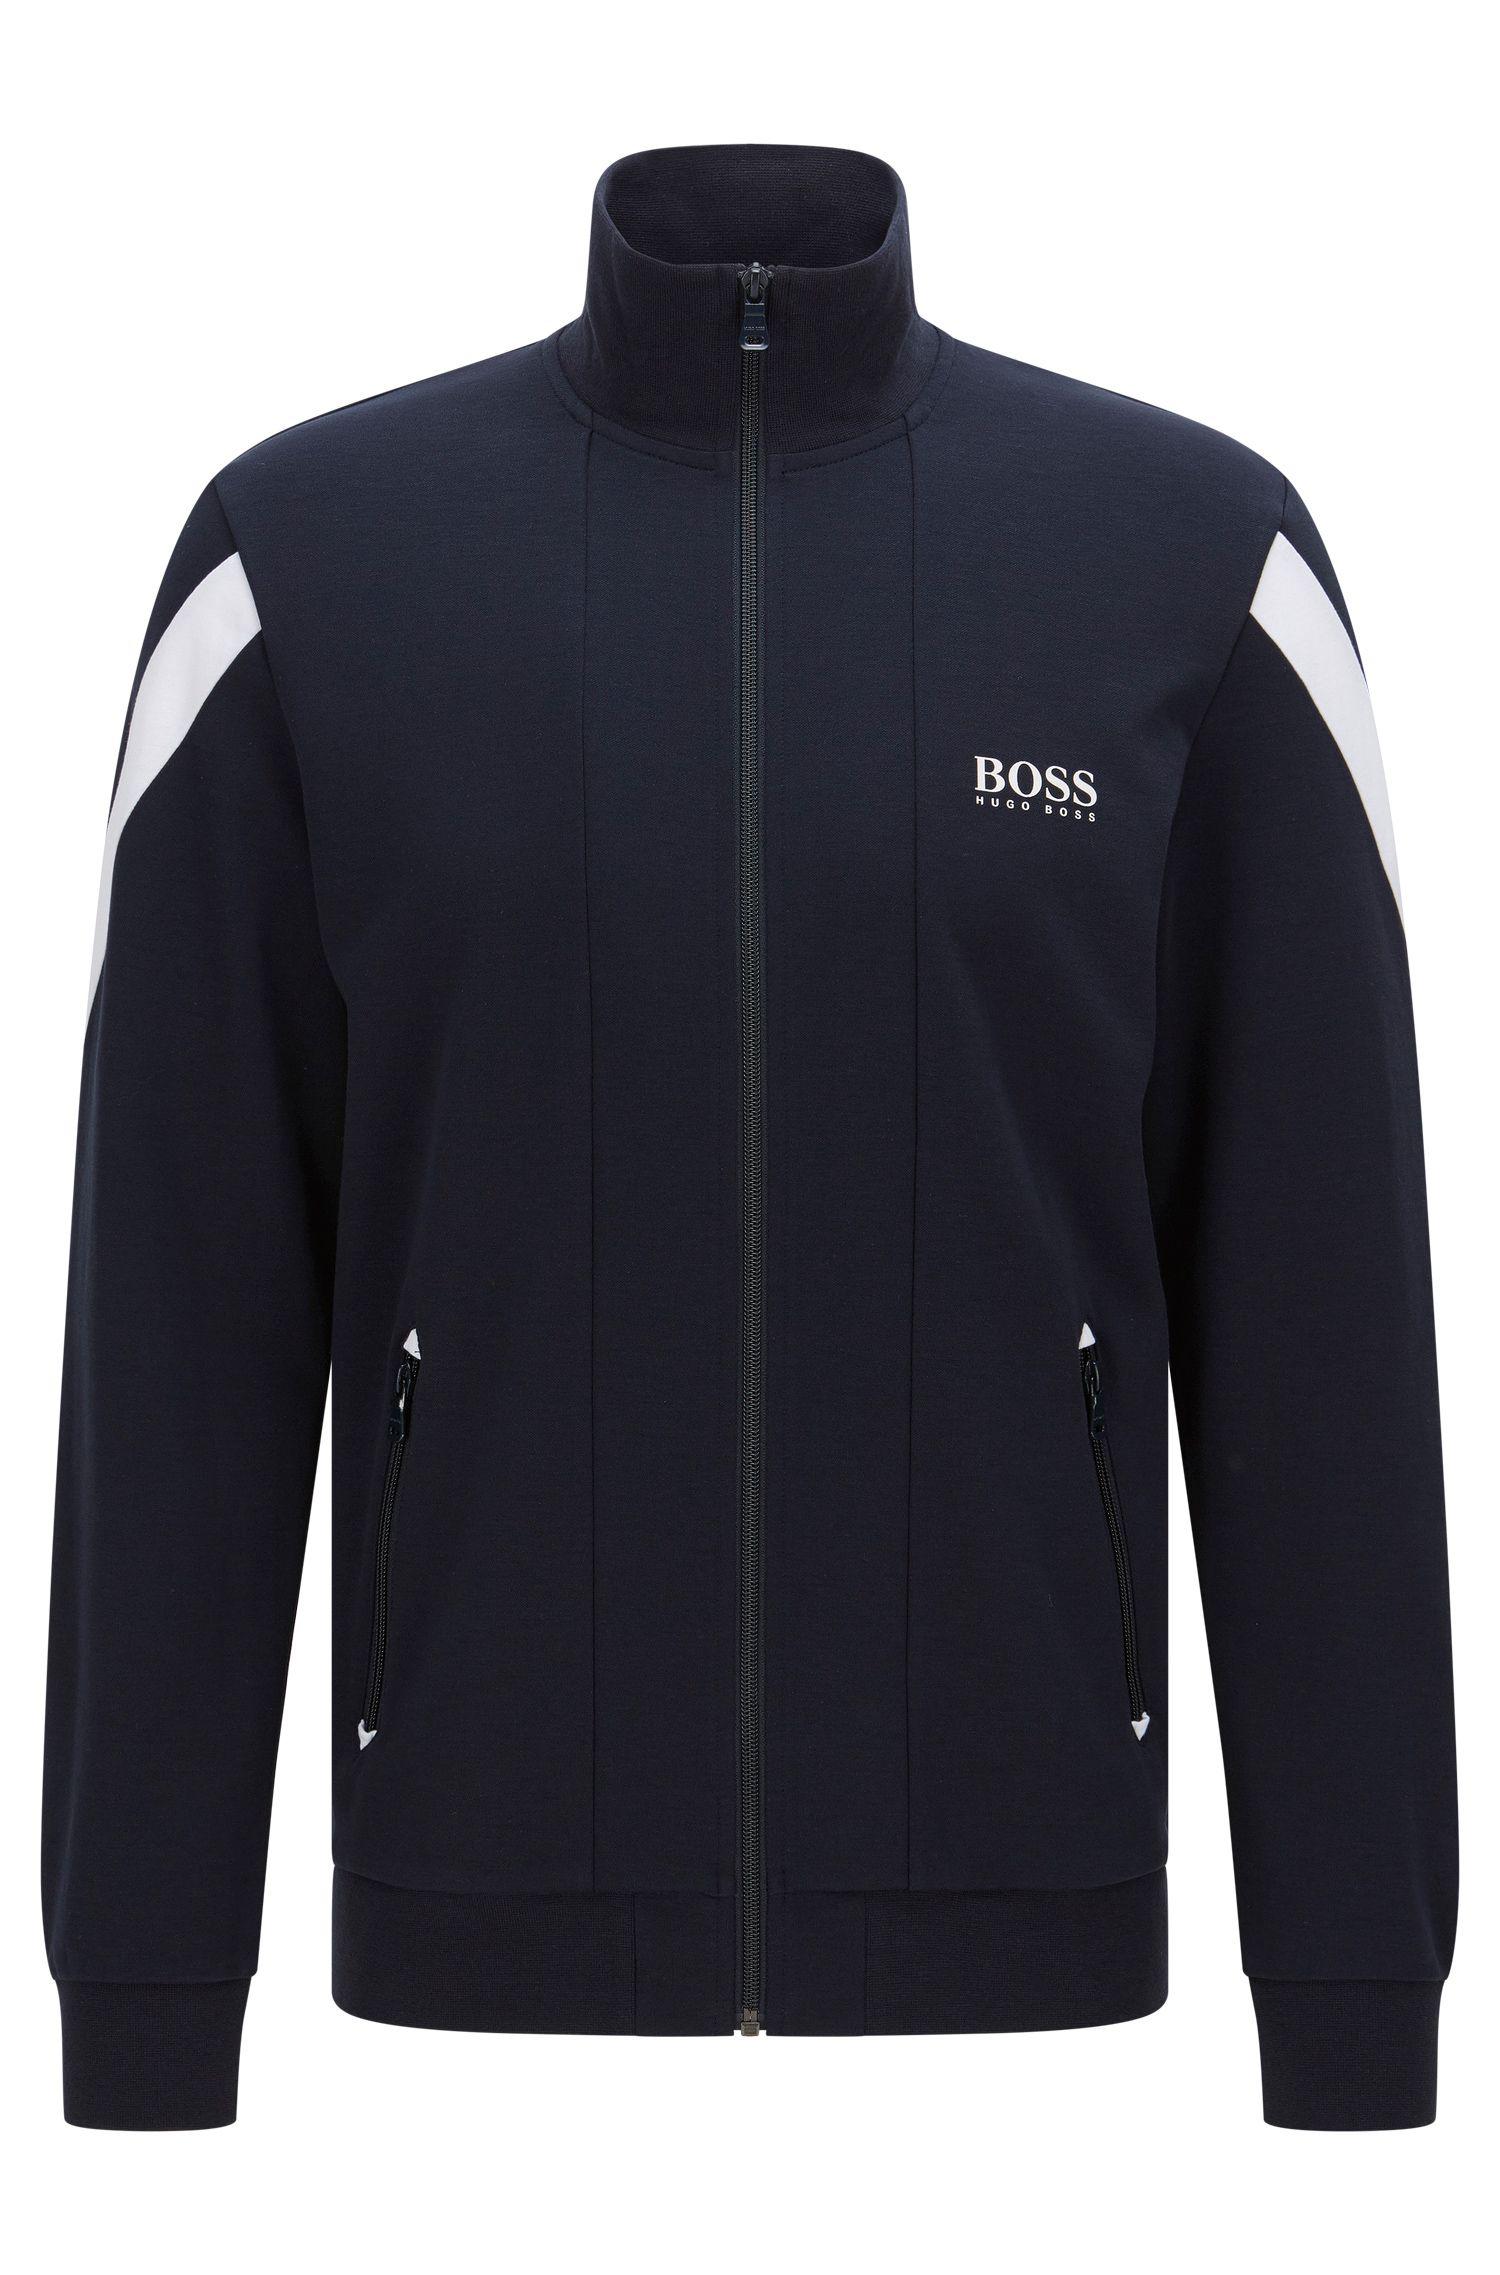 'Jacket Zip' | Stretch Cotton Zip Jersey Jacket